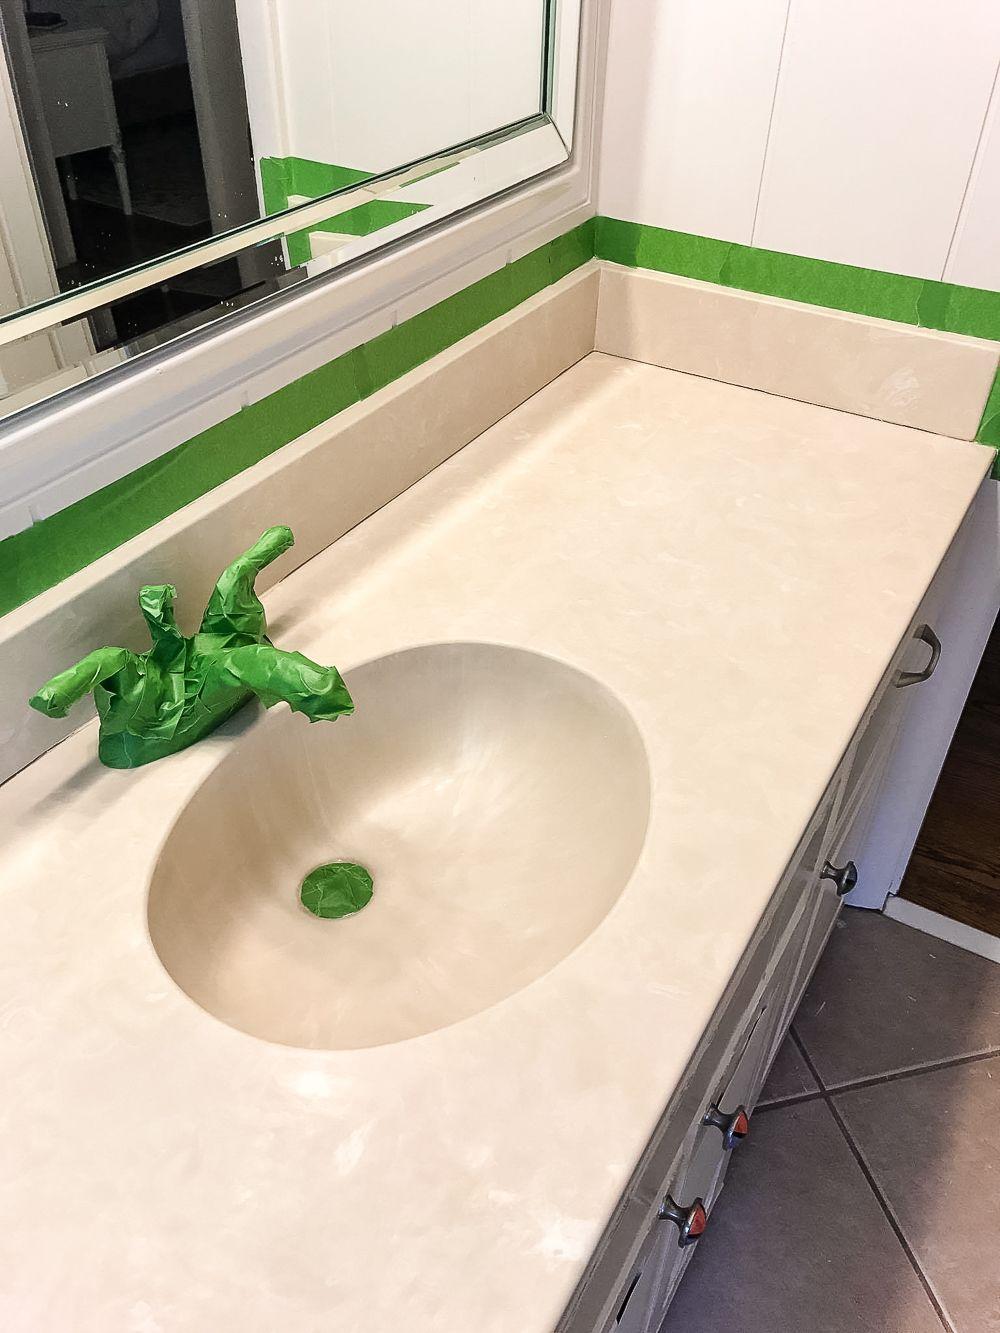 DIY Painted Bathroom Sink Countertop | blesserhouse.com - An 80s beige  cultured marble sink